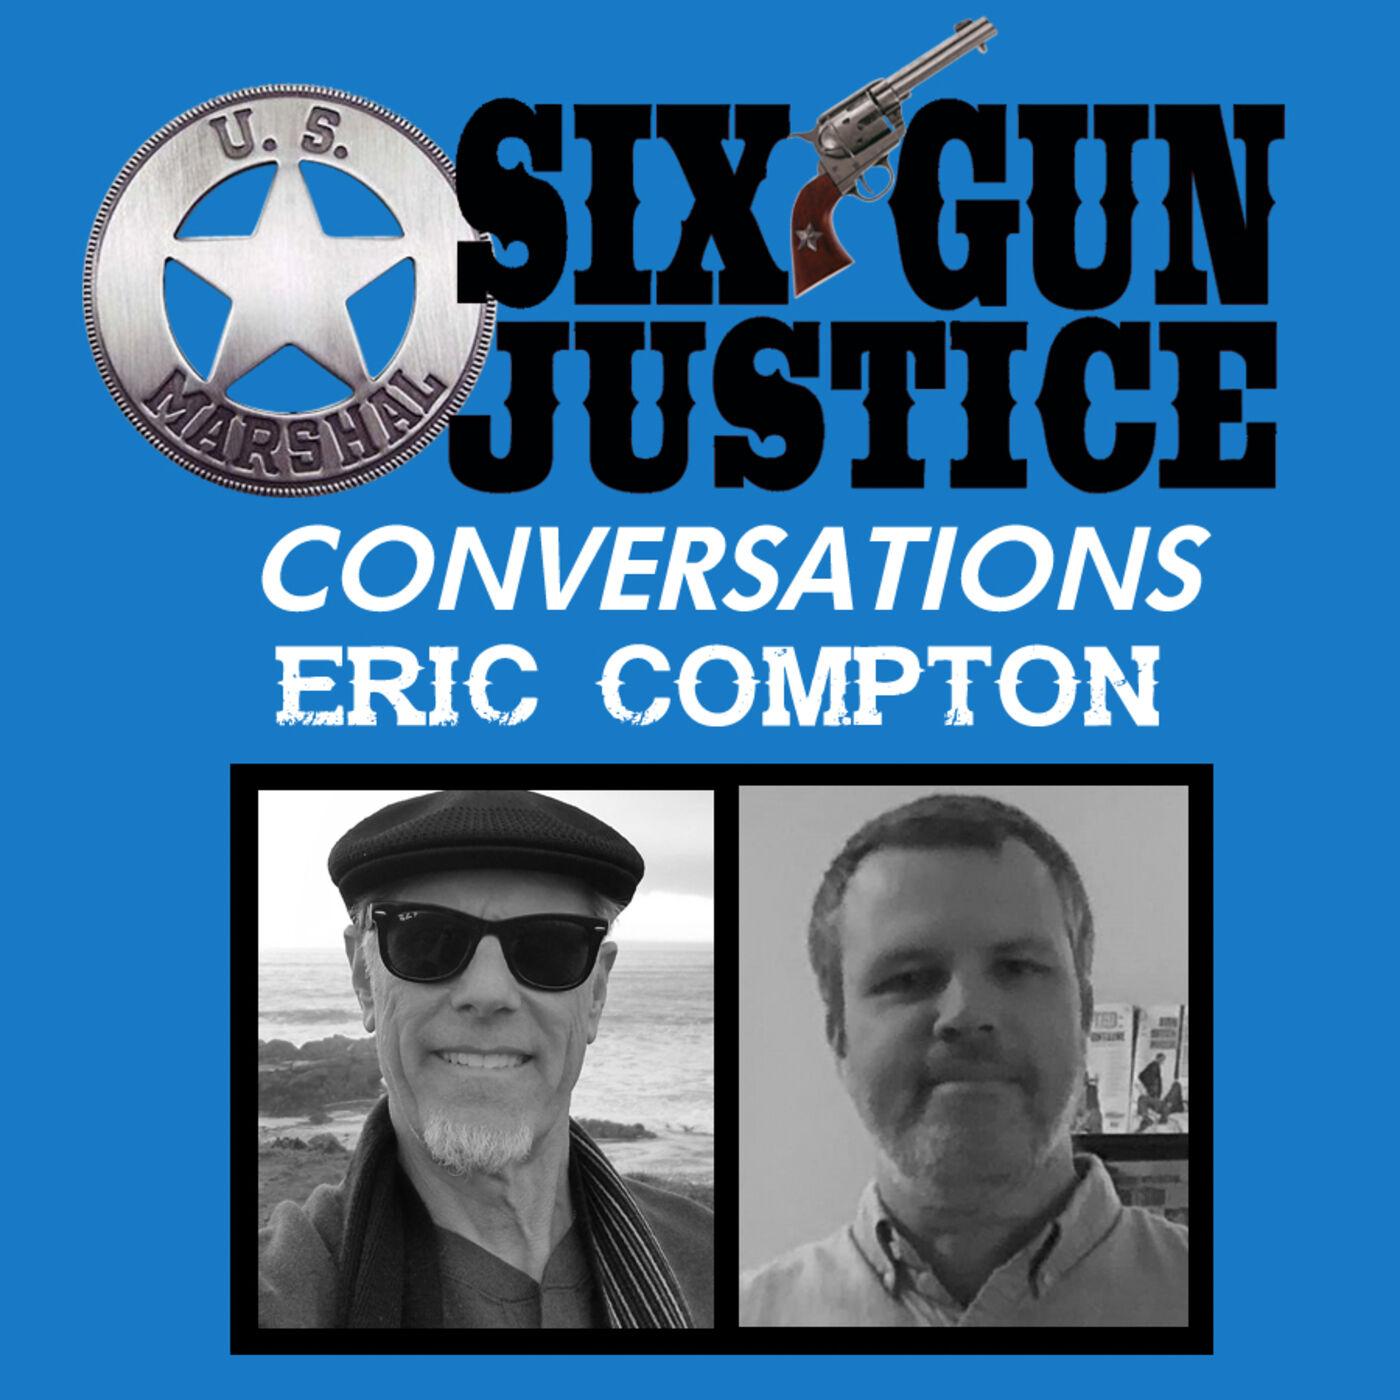 SIX-GUN JUSTICE CONVERSATIONS—ERIC COMPTON